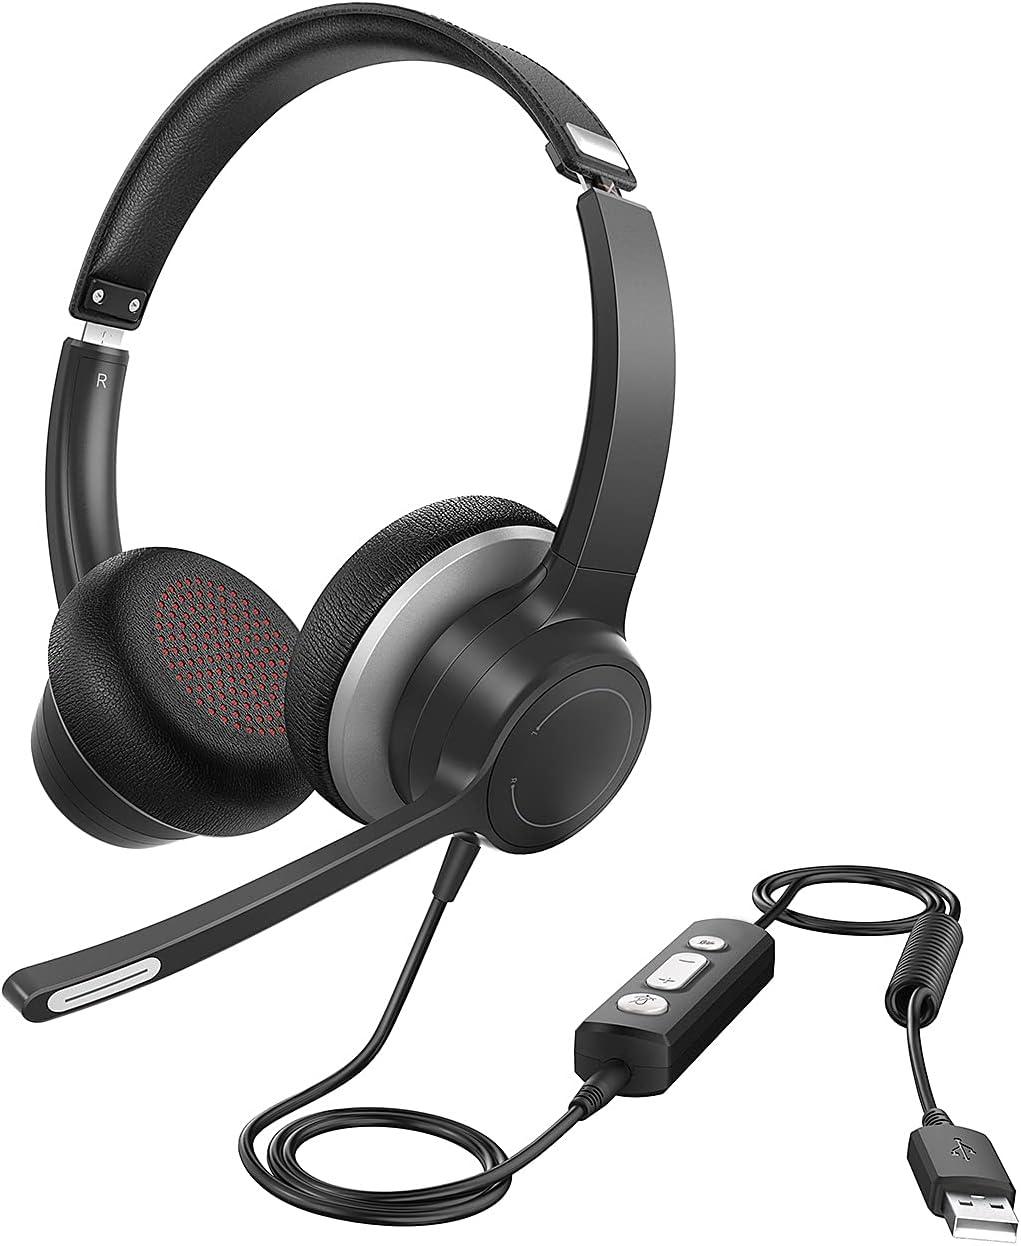 Top 10 Best usb skype headset